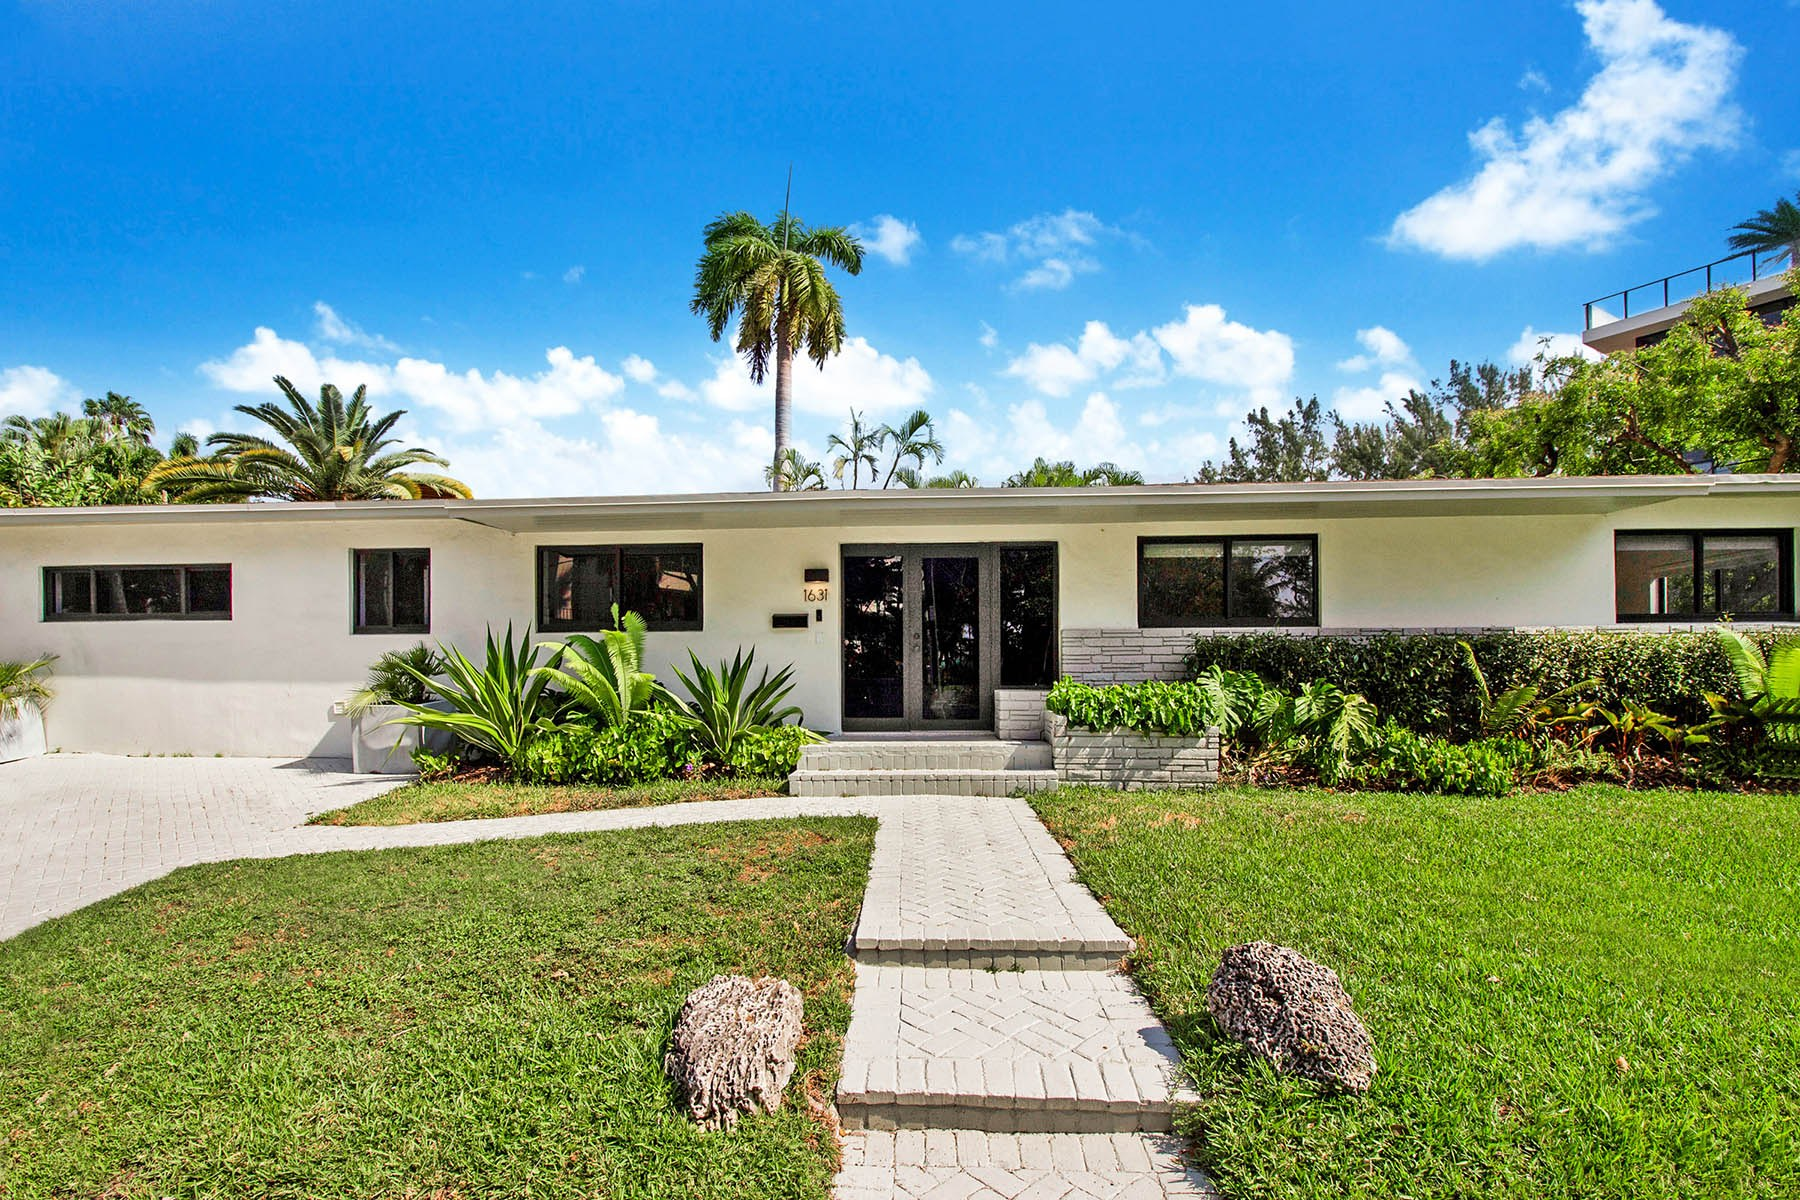 Single Family Homes por un Venta en 1631 S Bayshore Court, Coconut Grove, FL 1631 S Bayshore Court Coconut Grove, Florida 33133 Estados Unidos